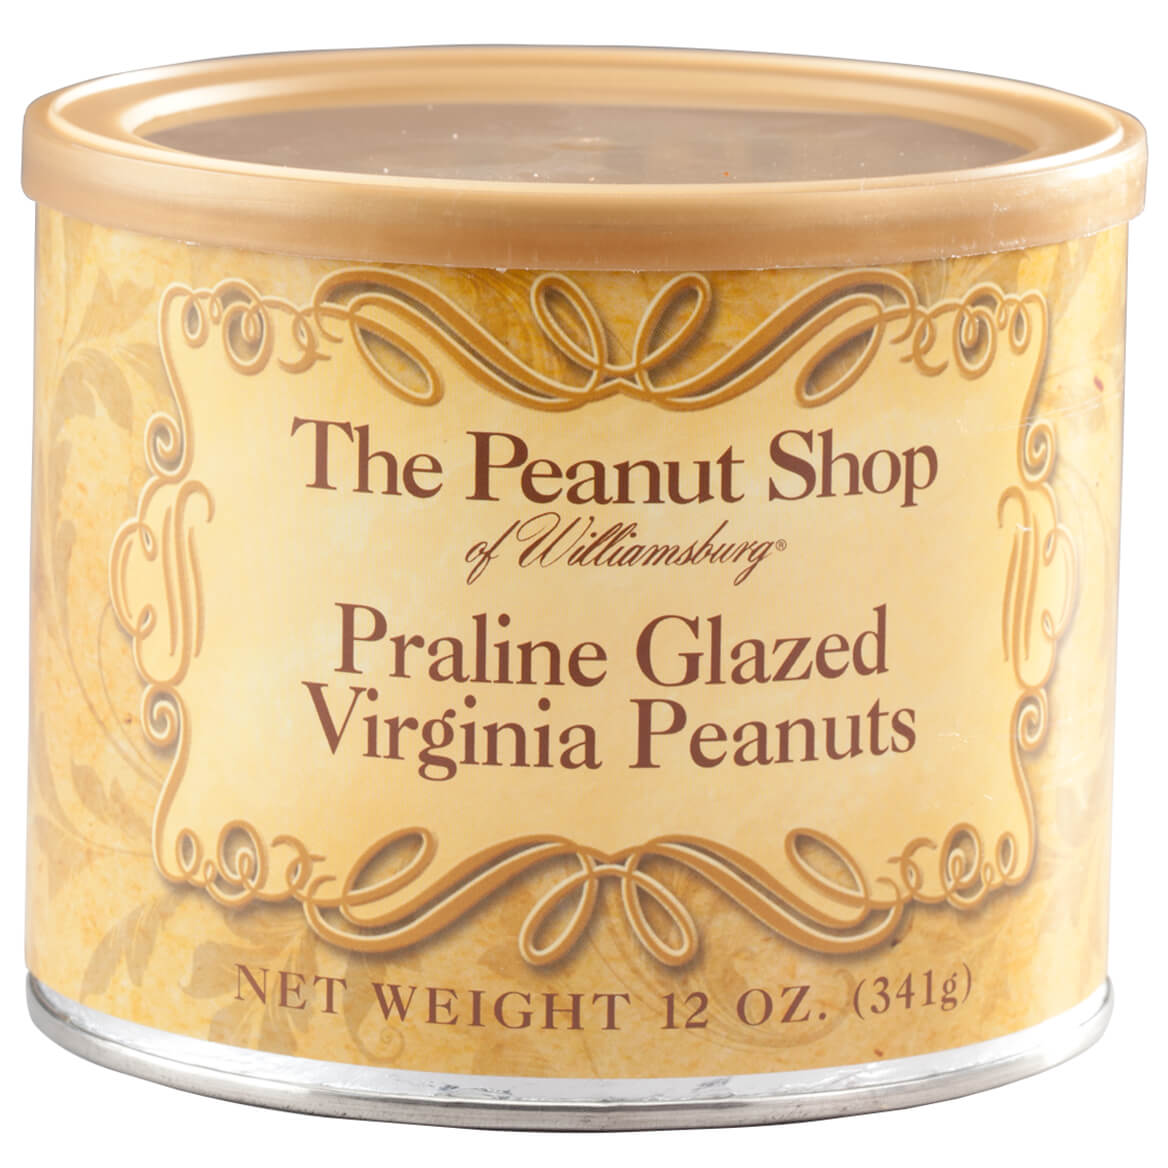 The Peanut Shop® Praline Glazed Peanuts, 12oz.